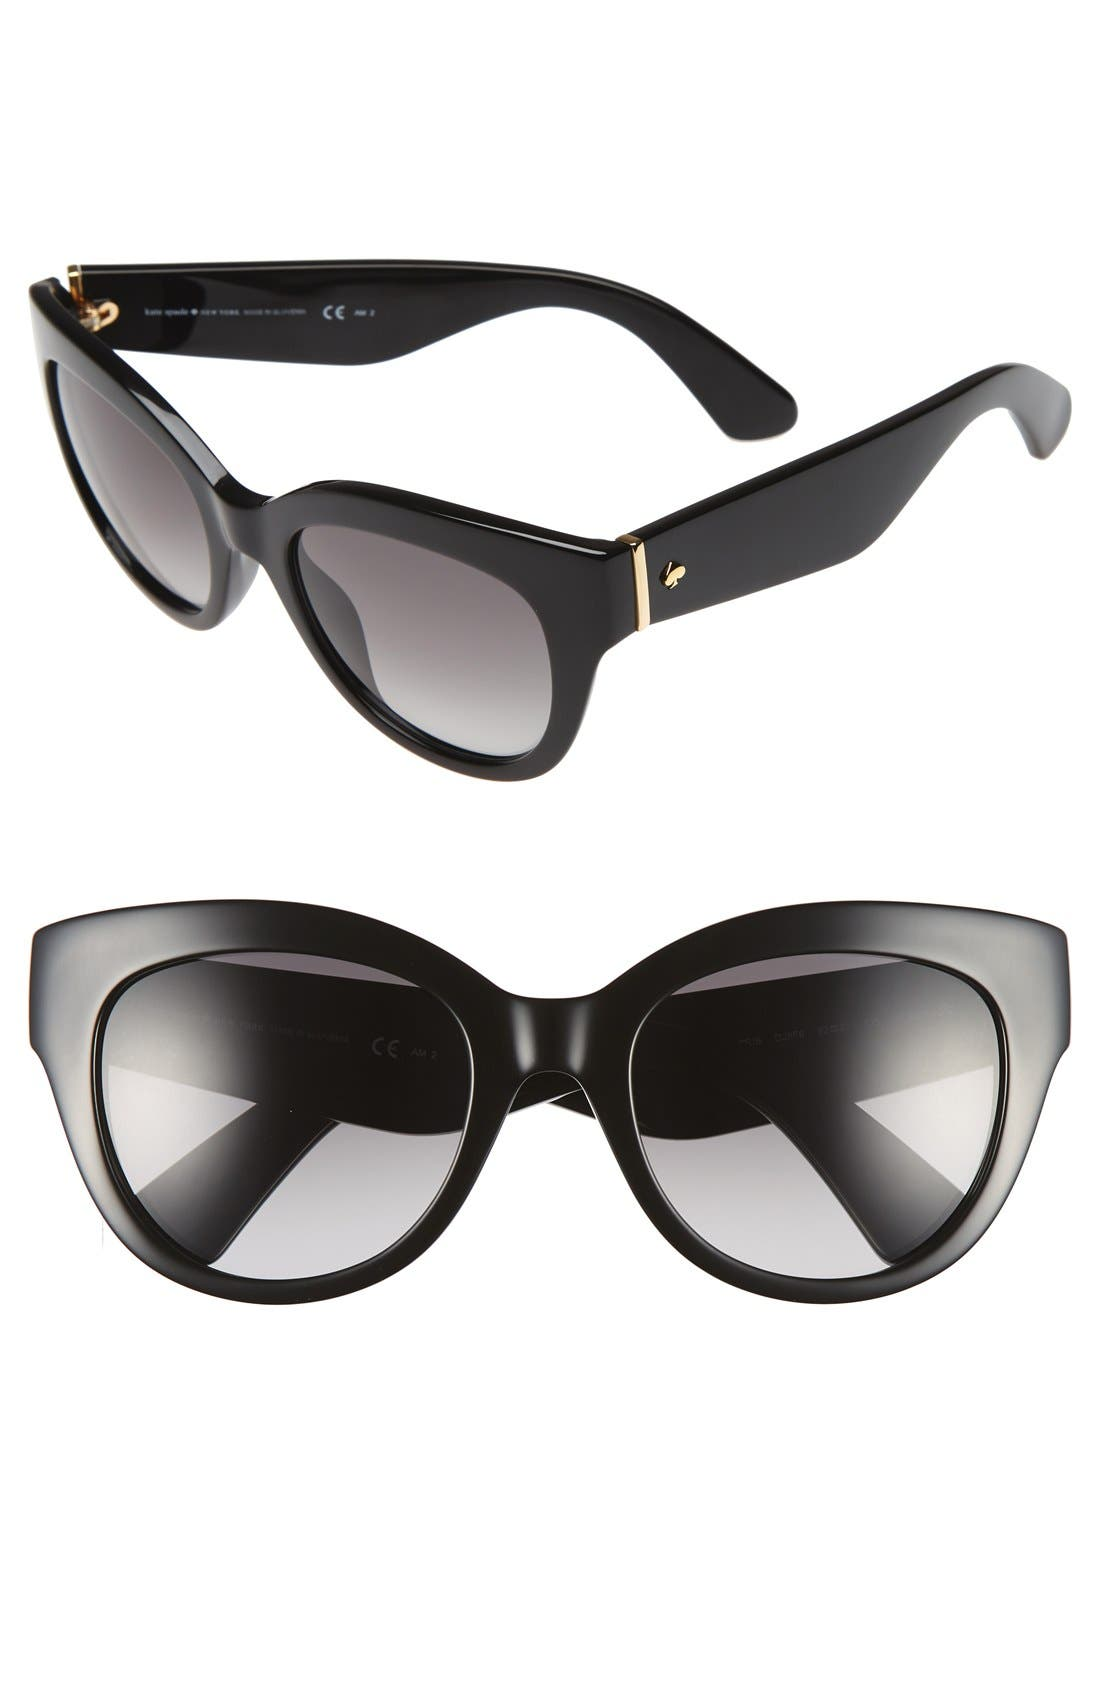 Alternate Image 1 Selected - kate spade new york 'sharlots' 52mm sunglasses